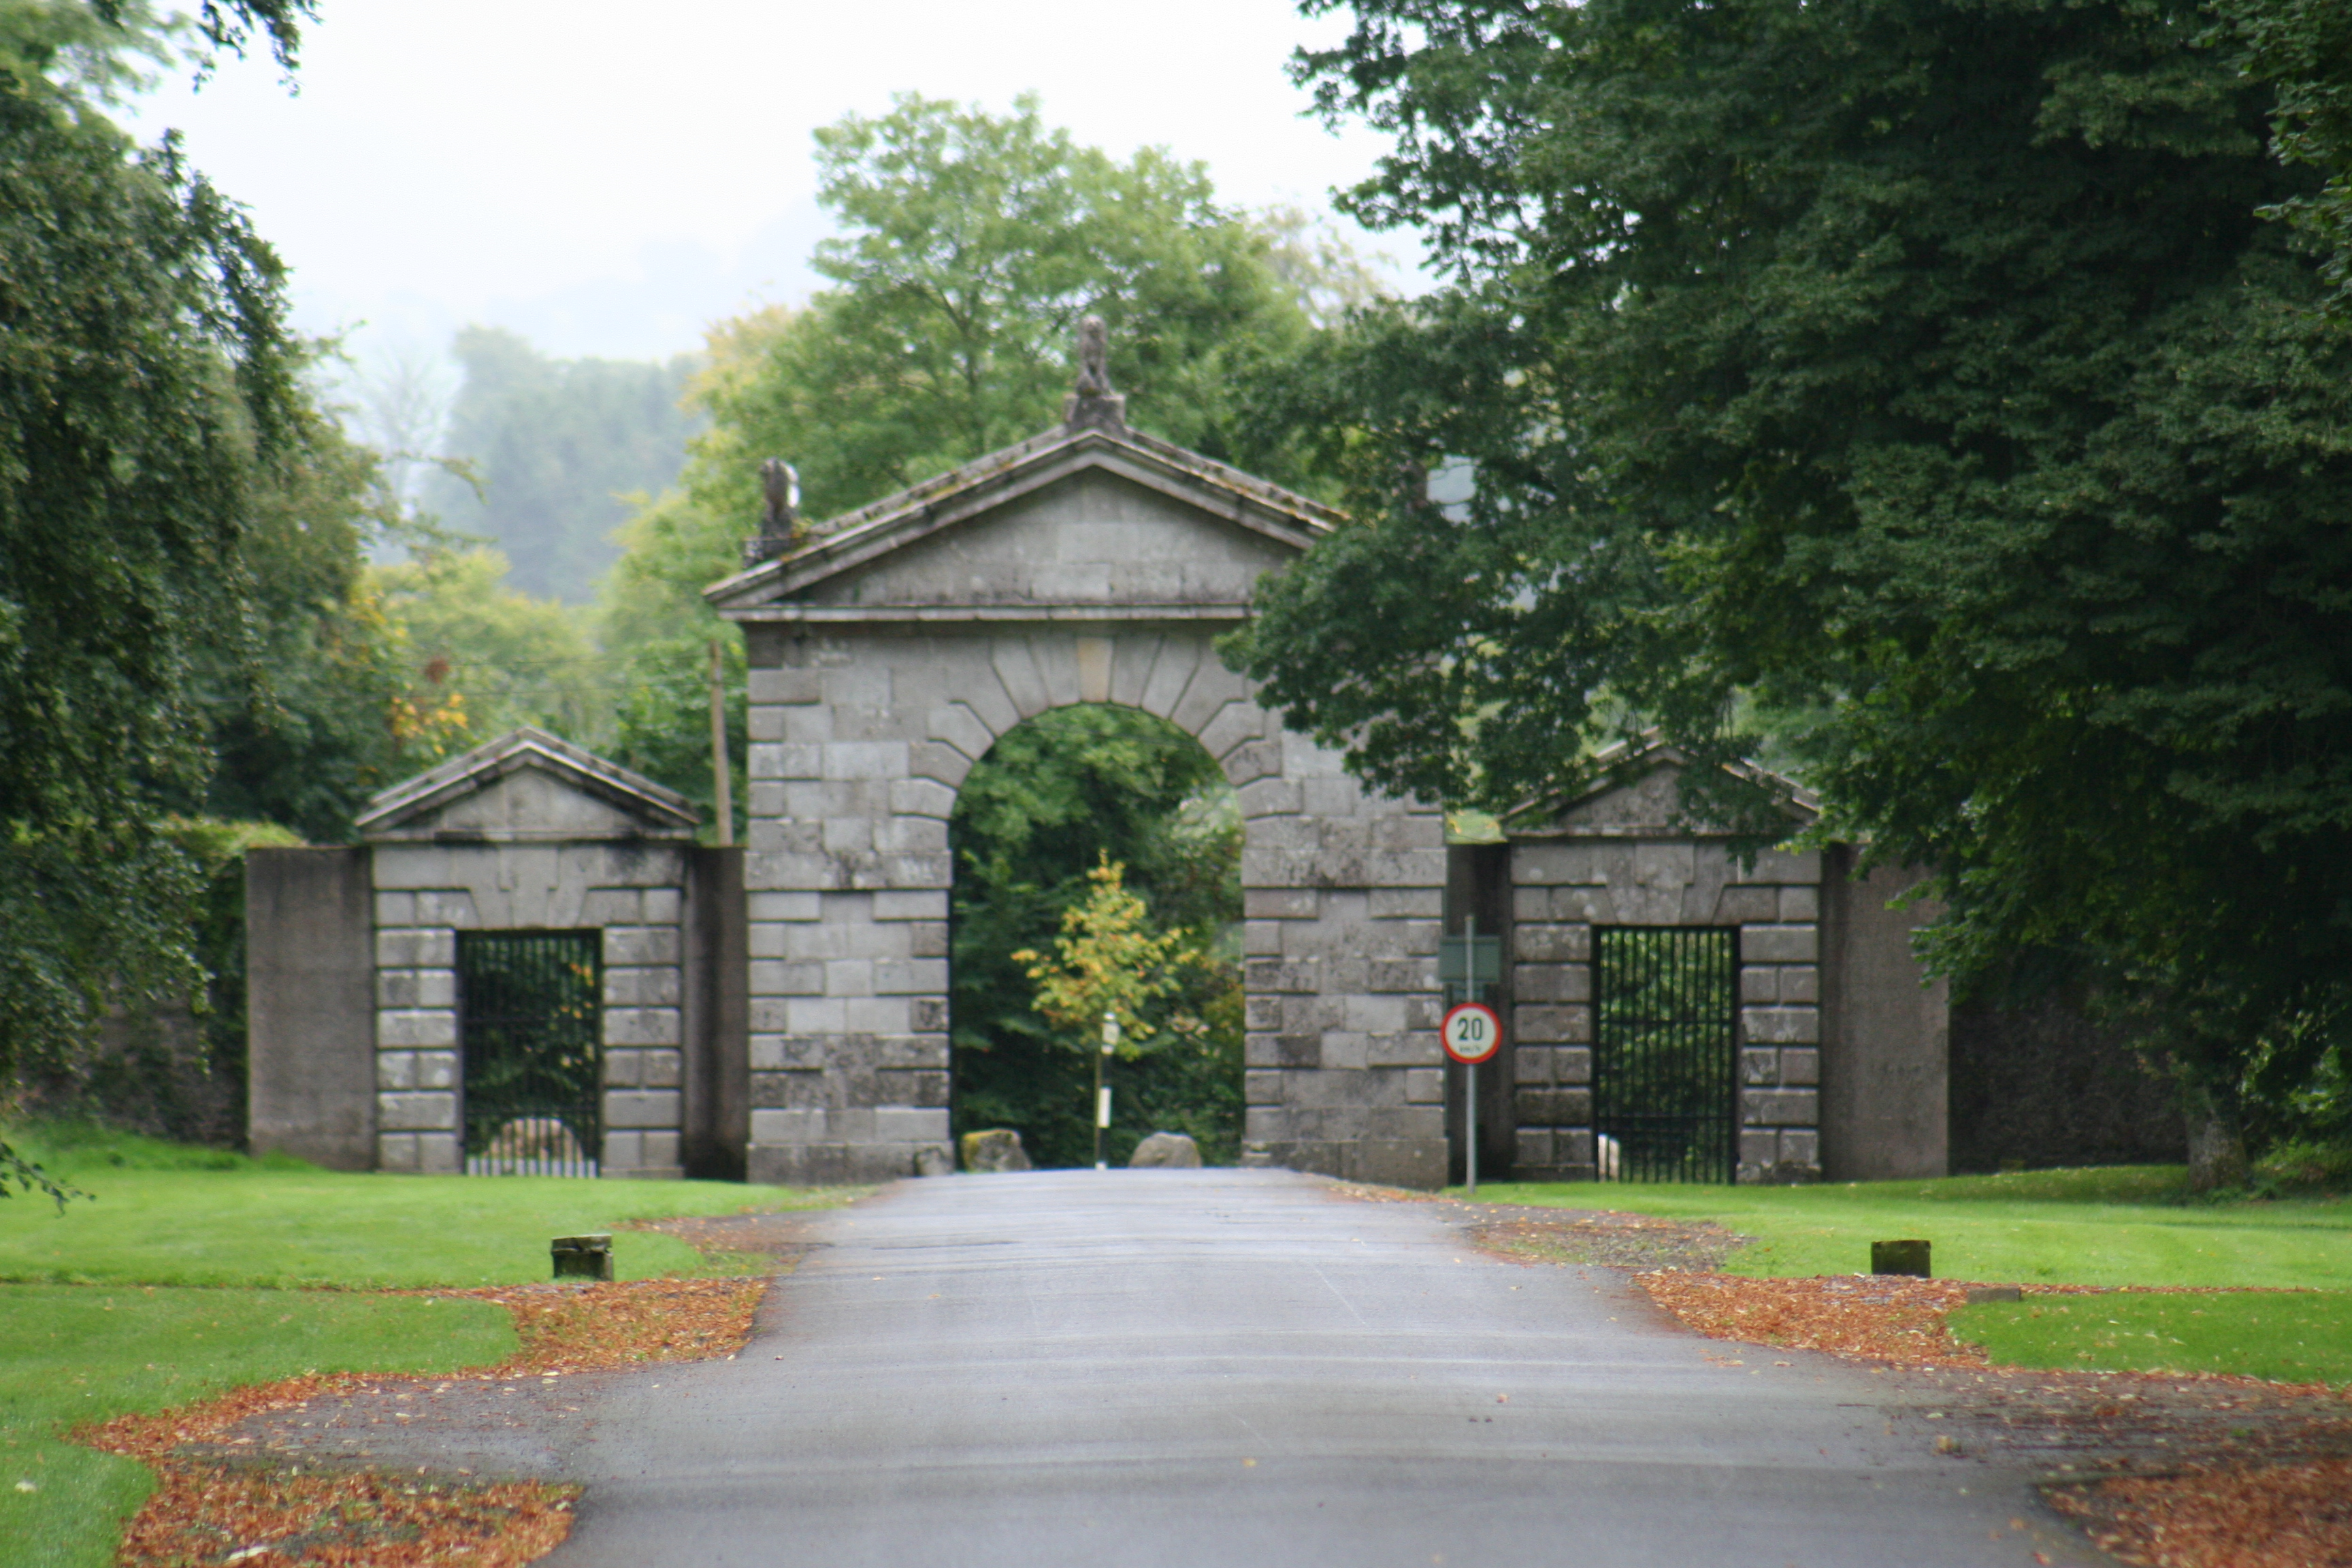 File:Russborough house entrance.jpg - Wikimedia Commons